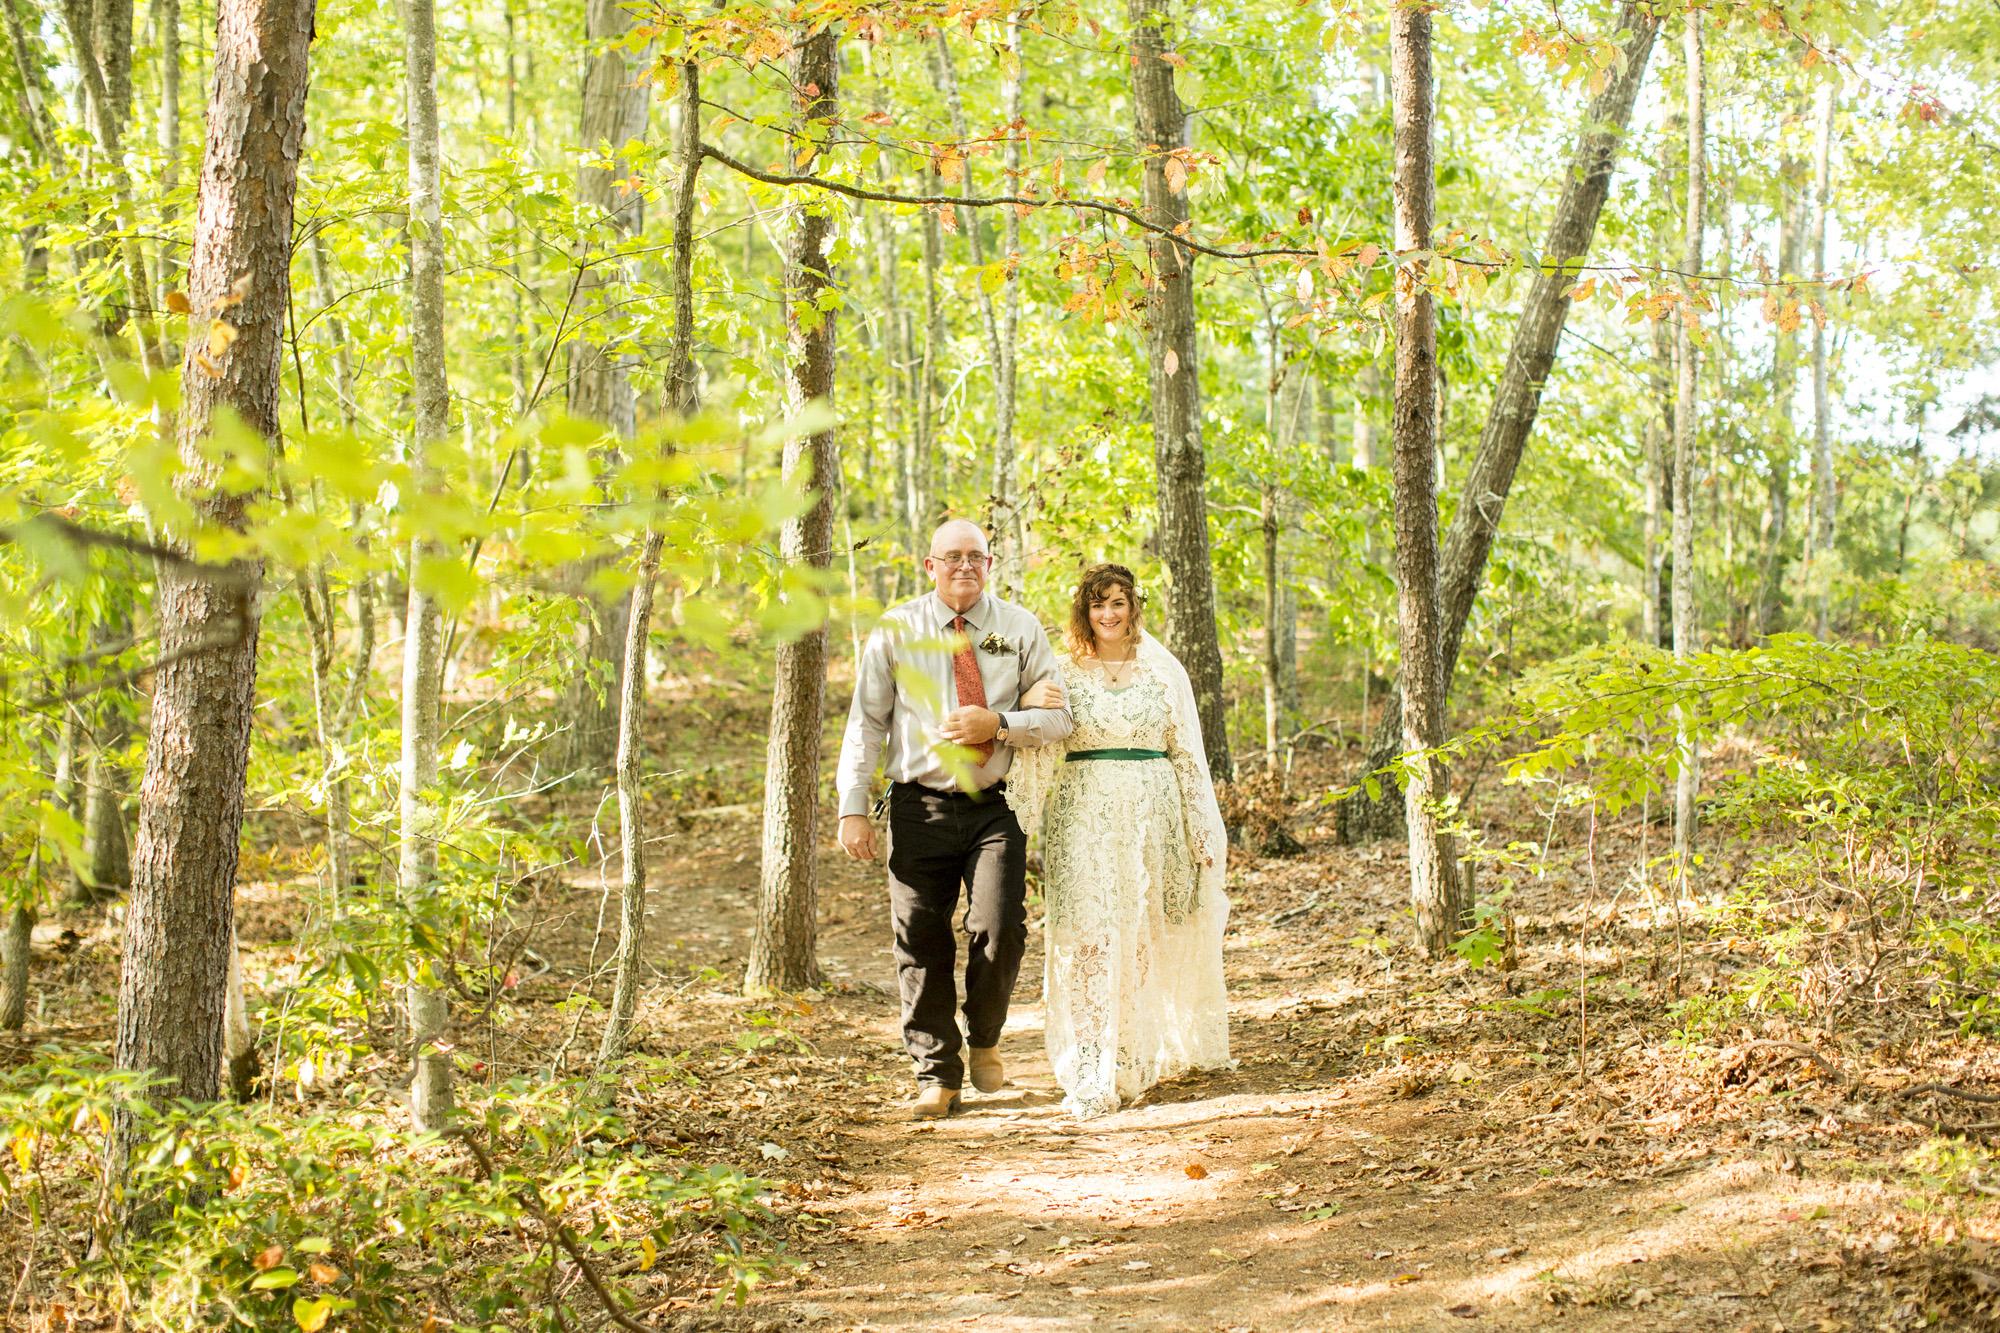 Seriously_Sabrina_Photography_Red_River_Gorge_Kentucky_Wedding_ShawnDana111.jpg